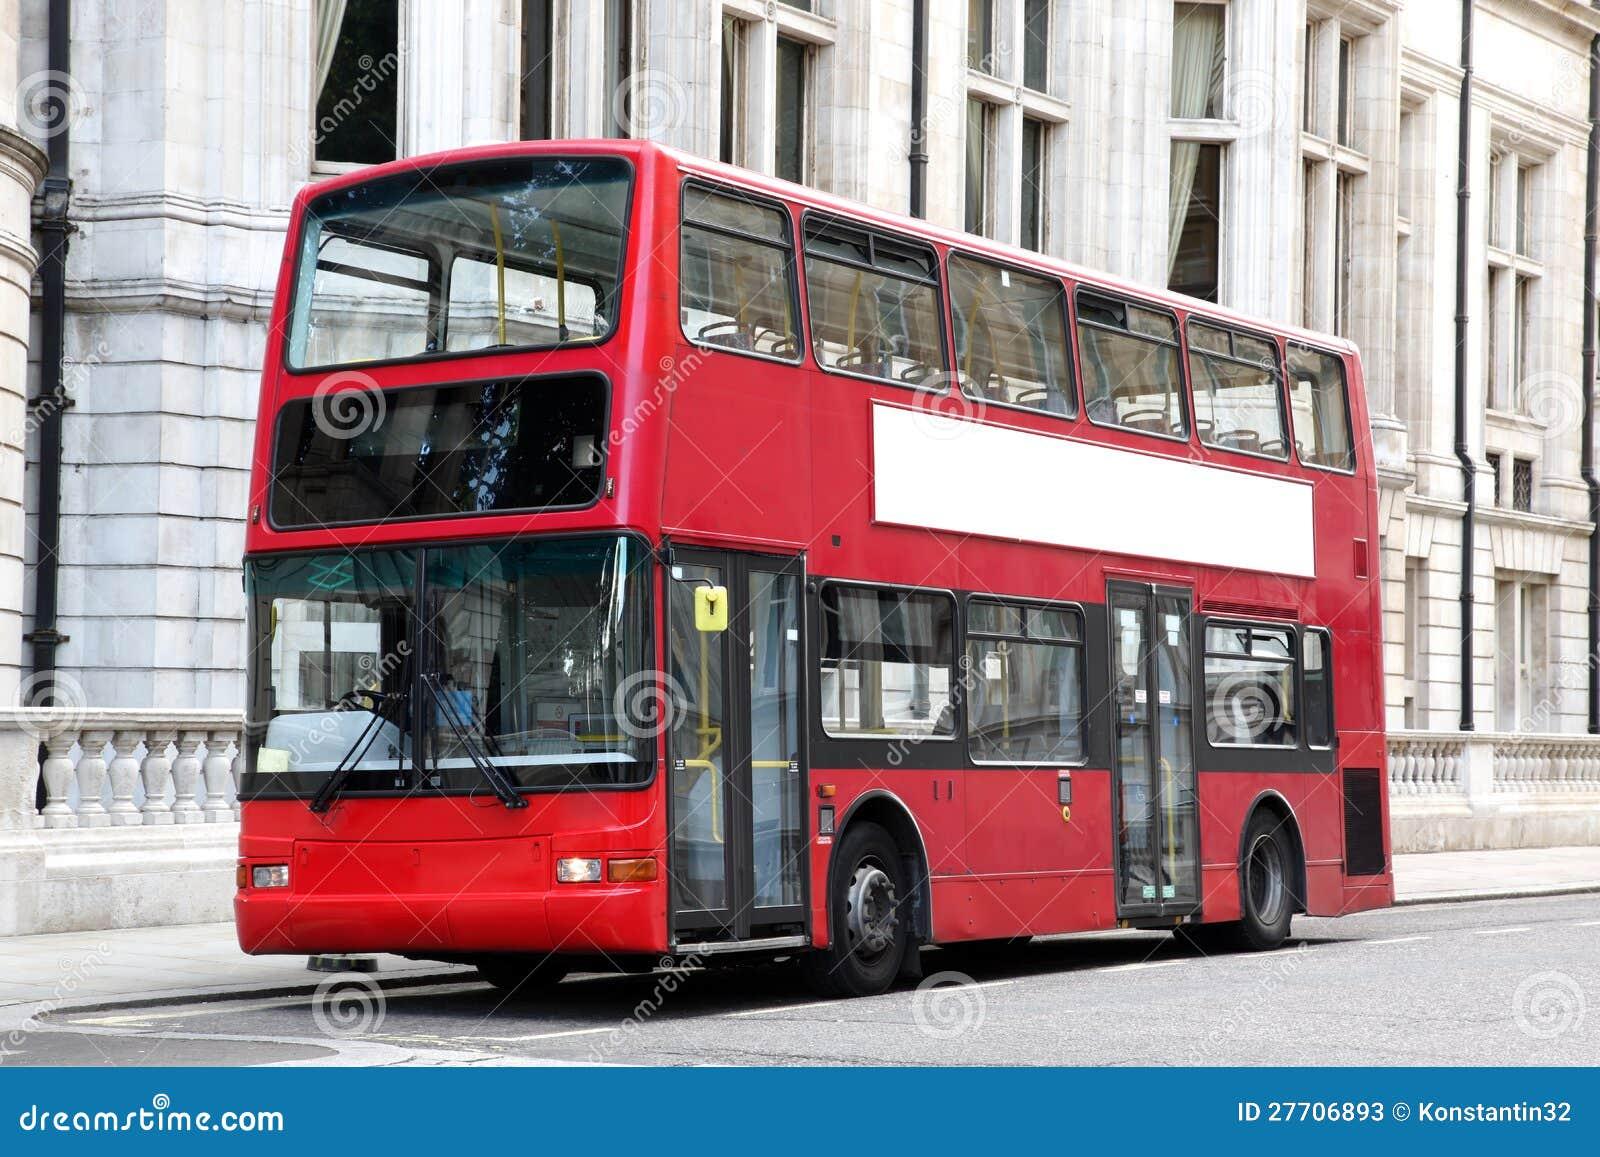 london double decker red bus stock photos